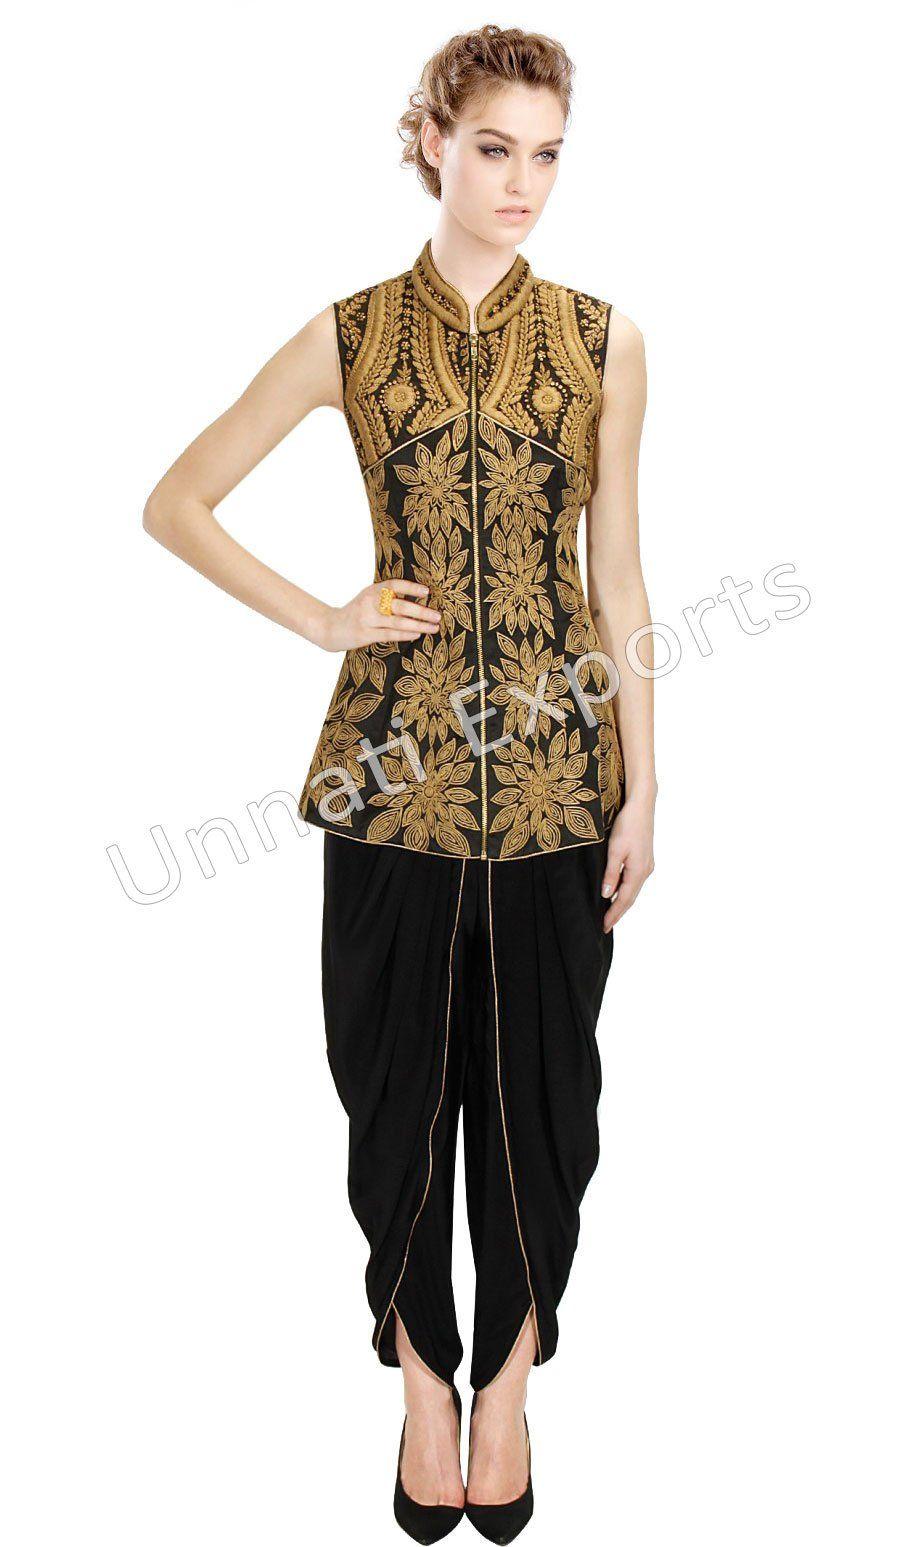 30cb5386b892 Amazon.com  Unnati Women s Dhoti Style Heavy Embroidery Readymade ...